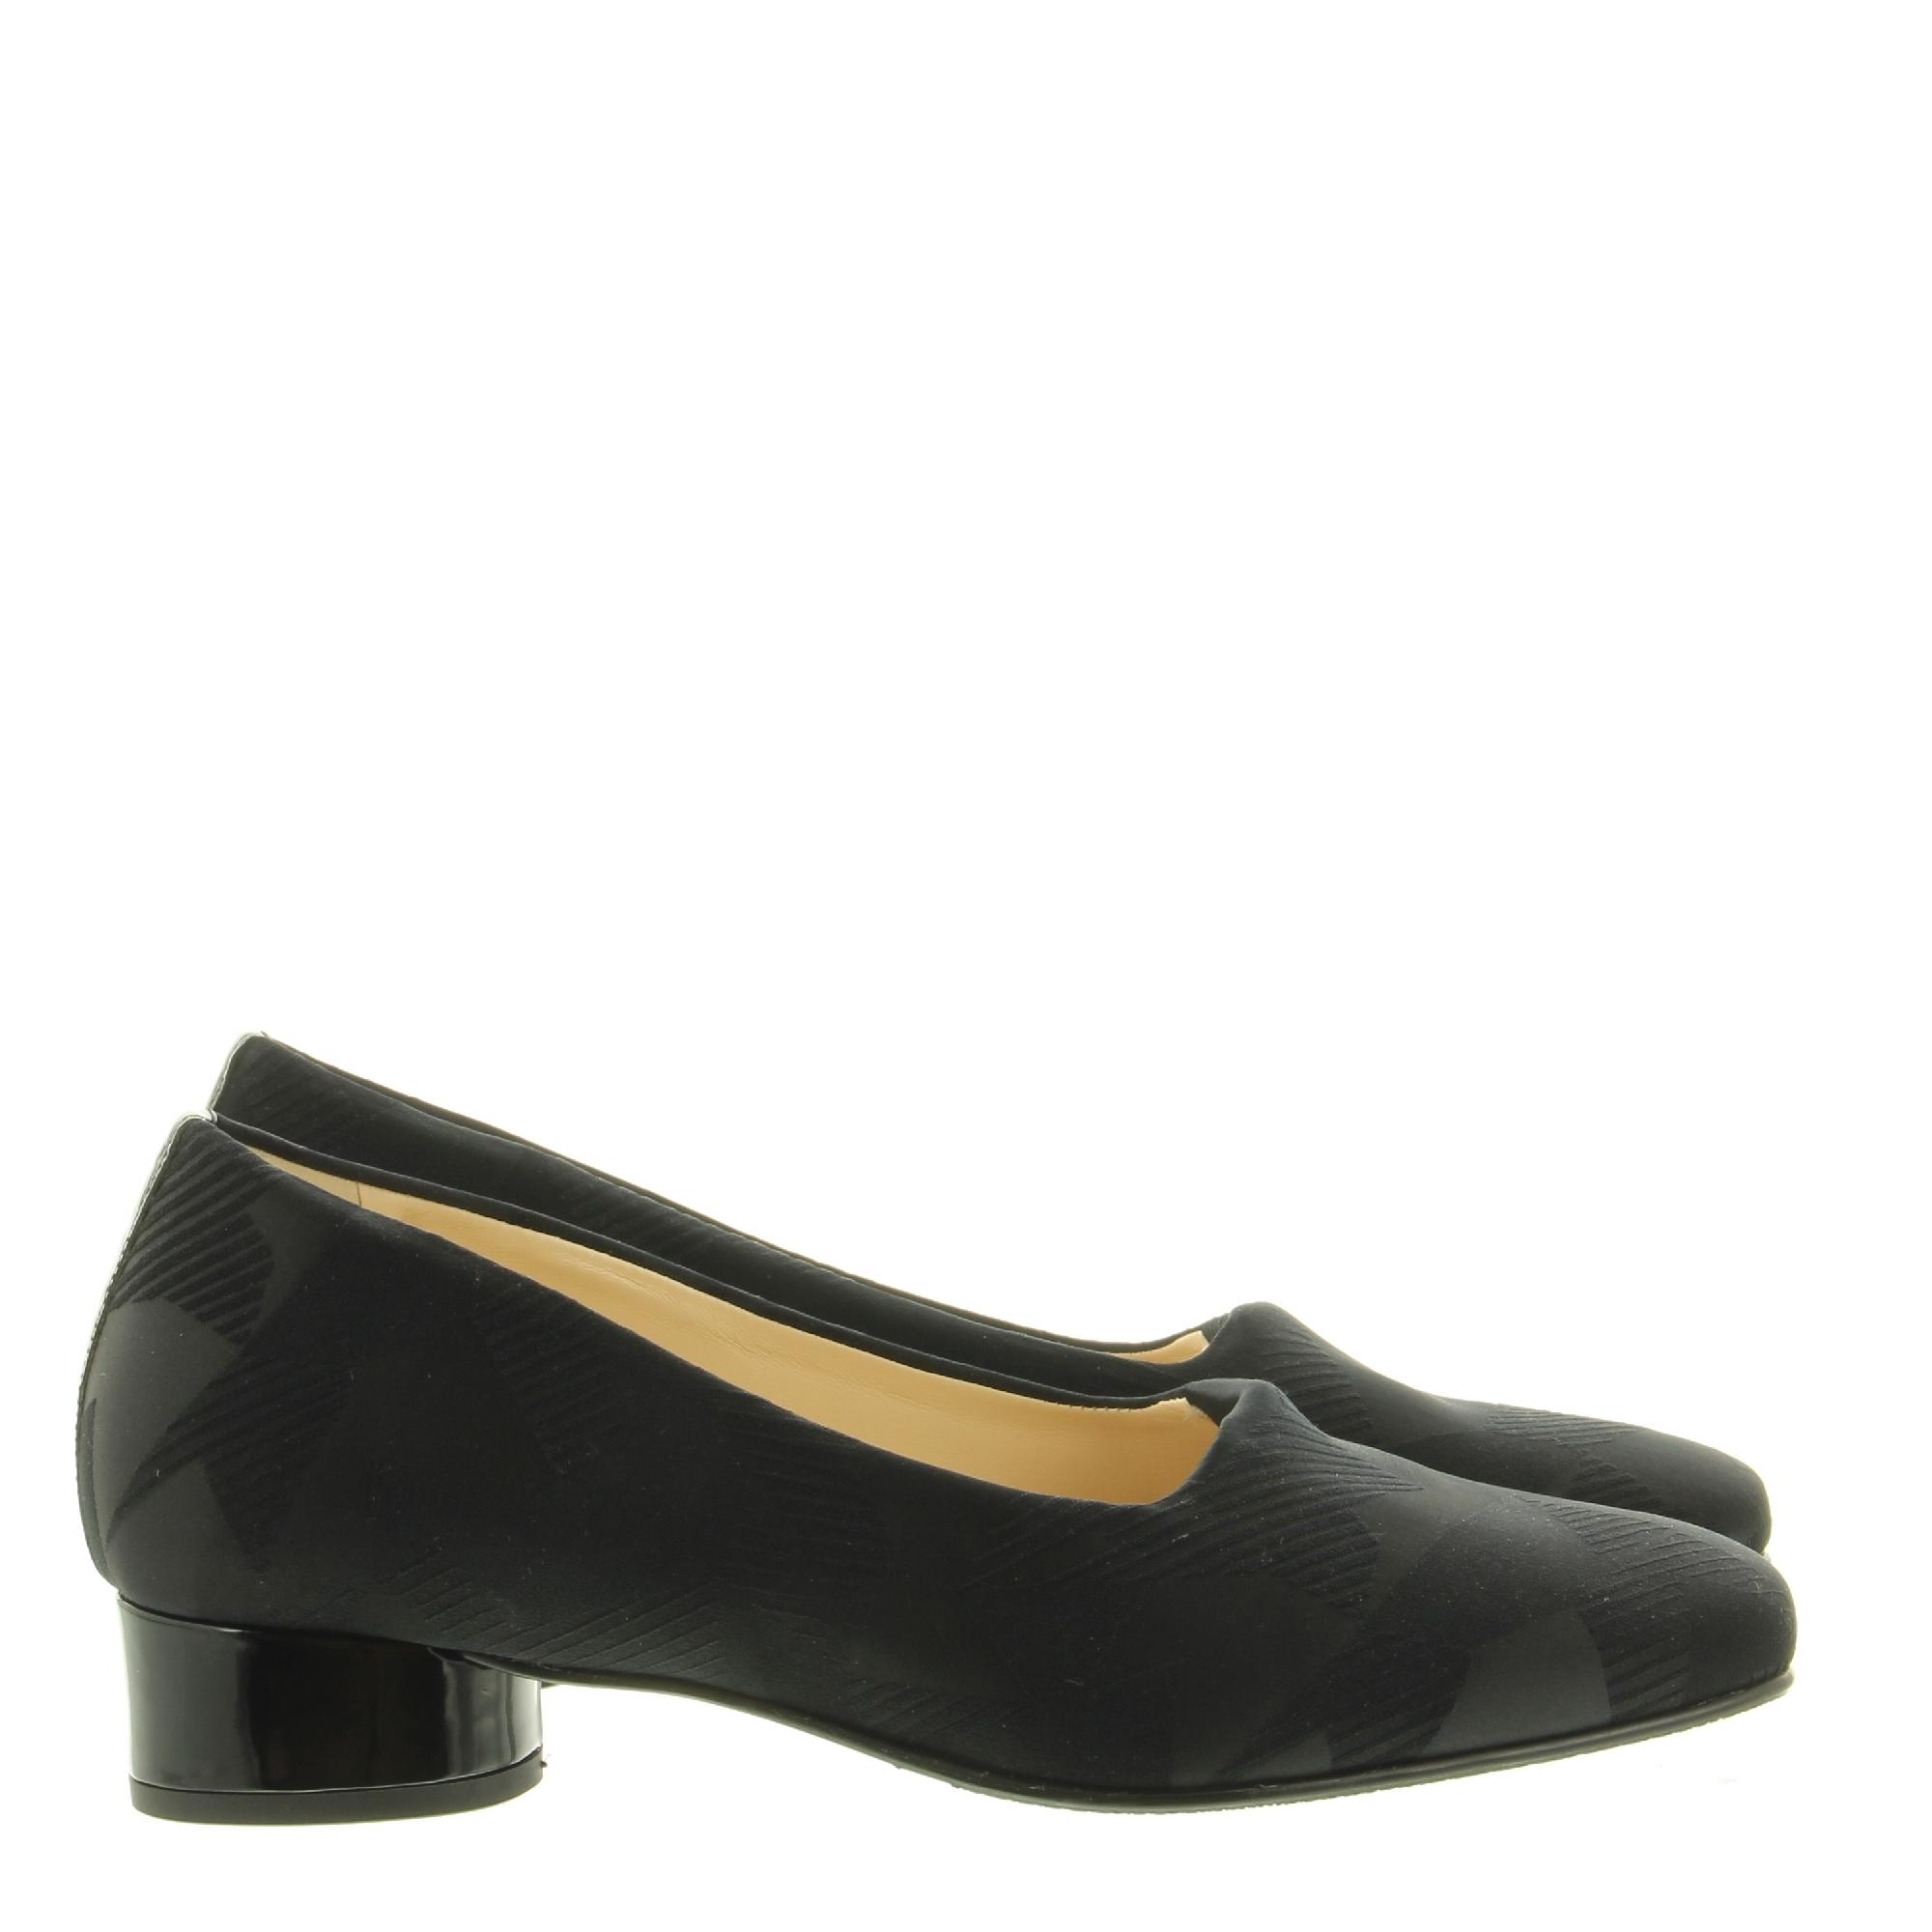 Hassia Shoes 302634 Roma 0100 Schwarz